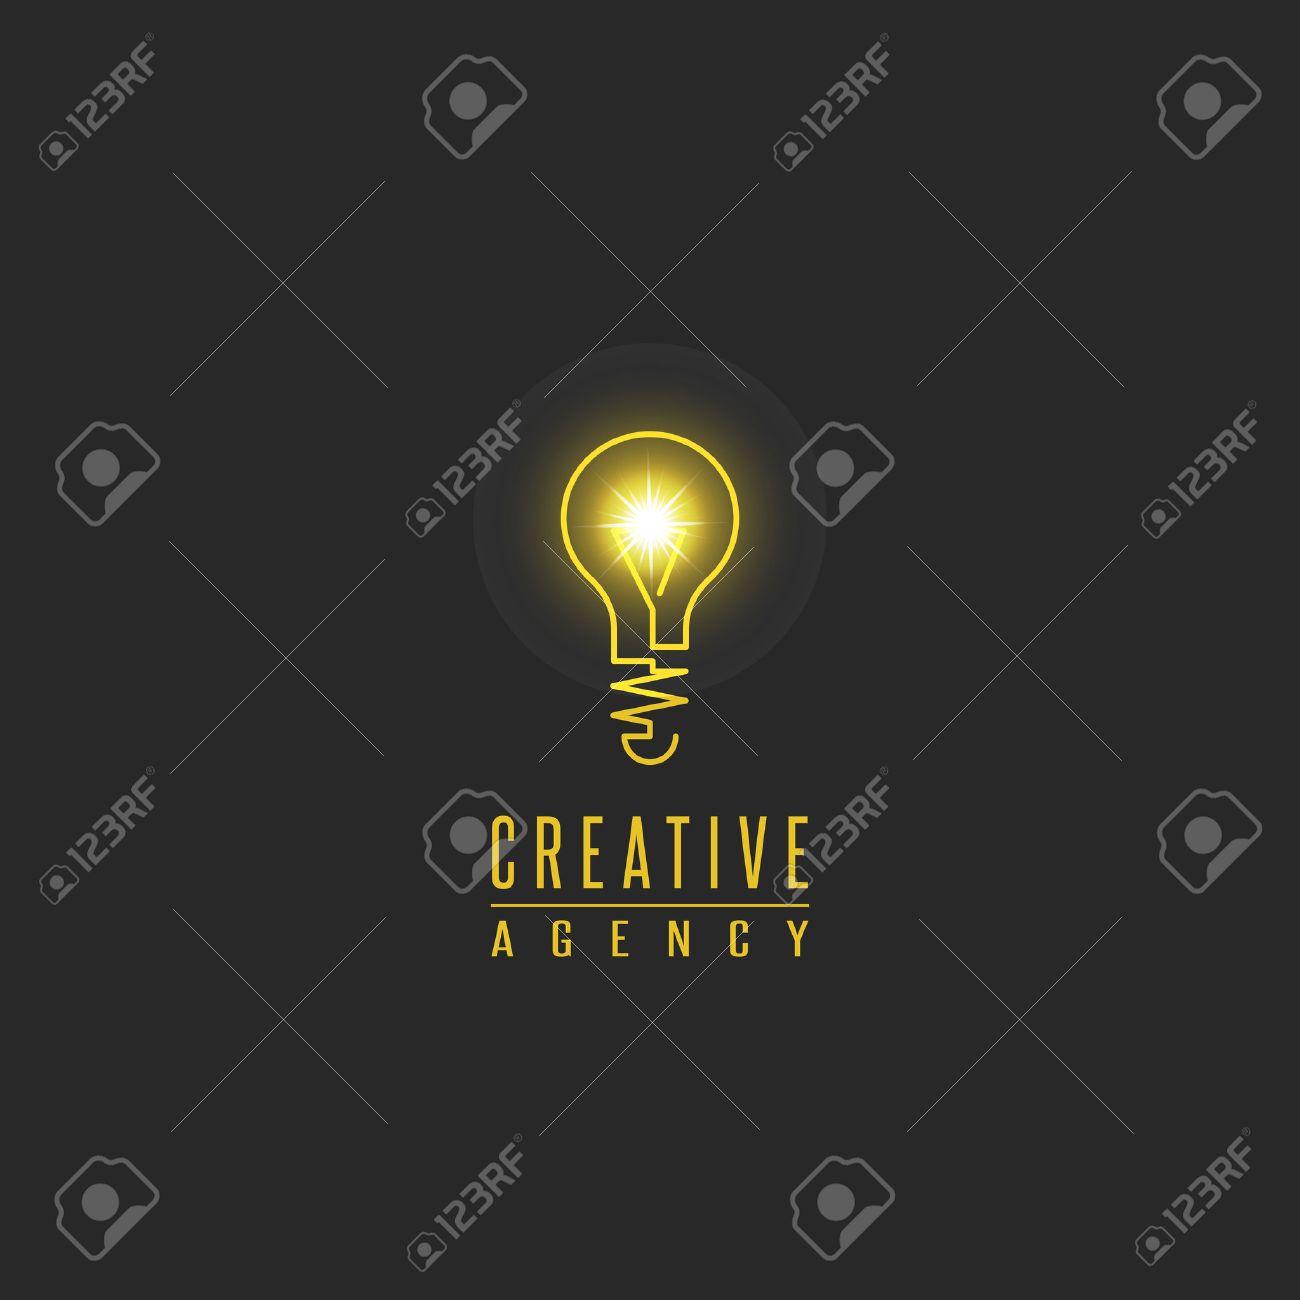 Light bulb logo, lamp shine creative innovation sign, web development, advertising, design agency emblem, idea power technology mark - 47325077